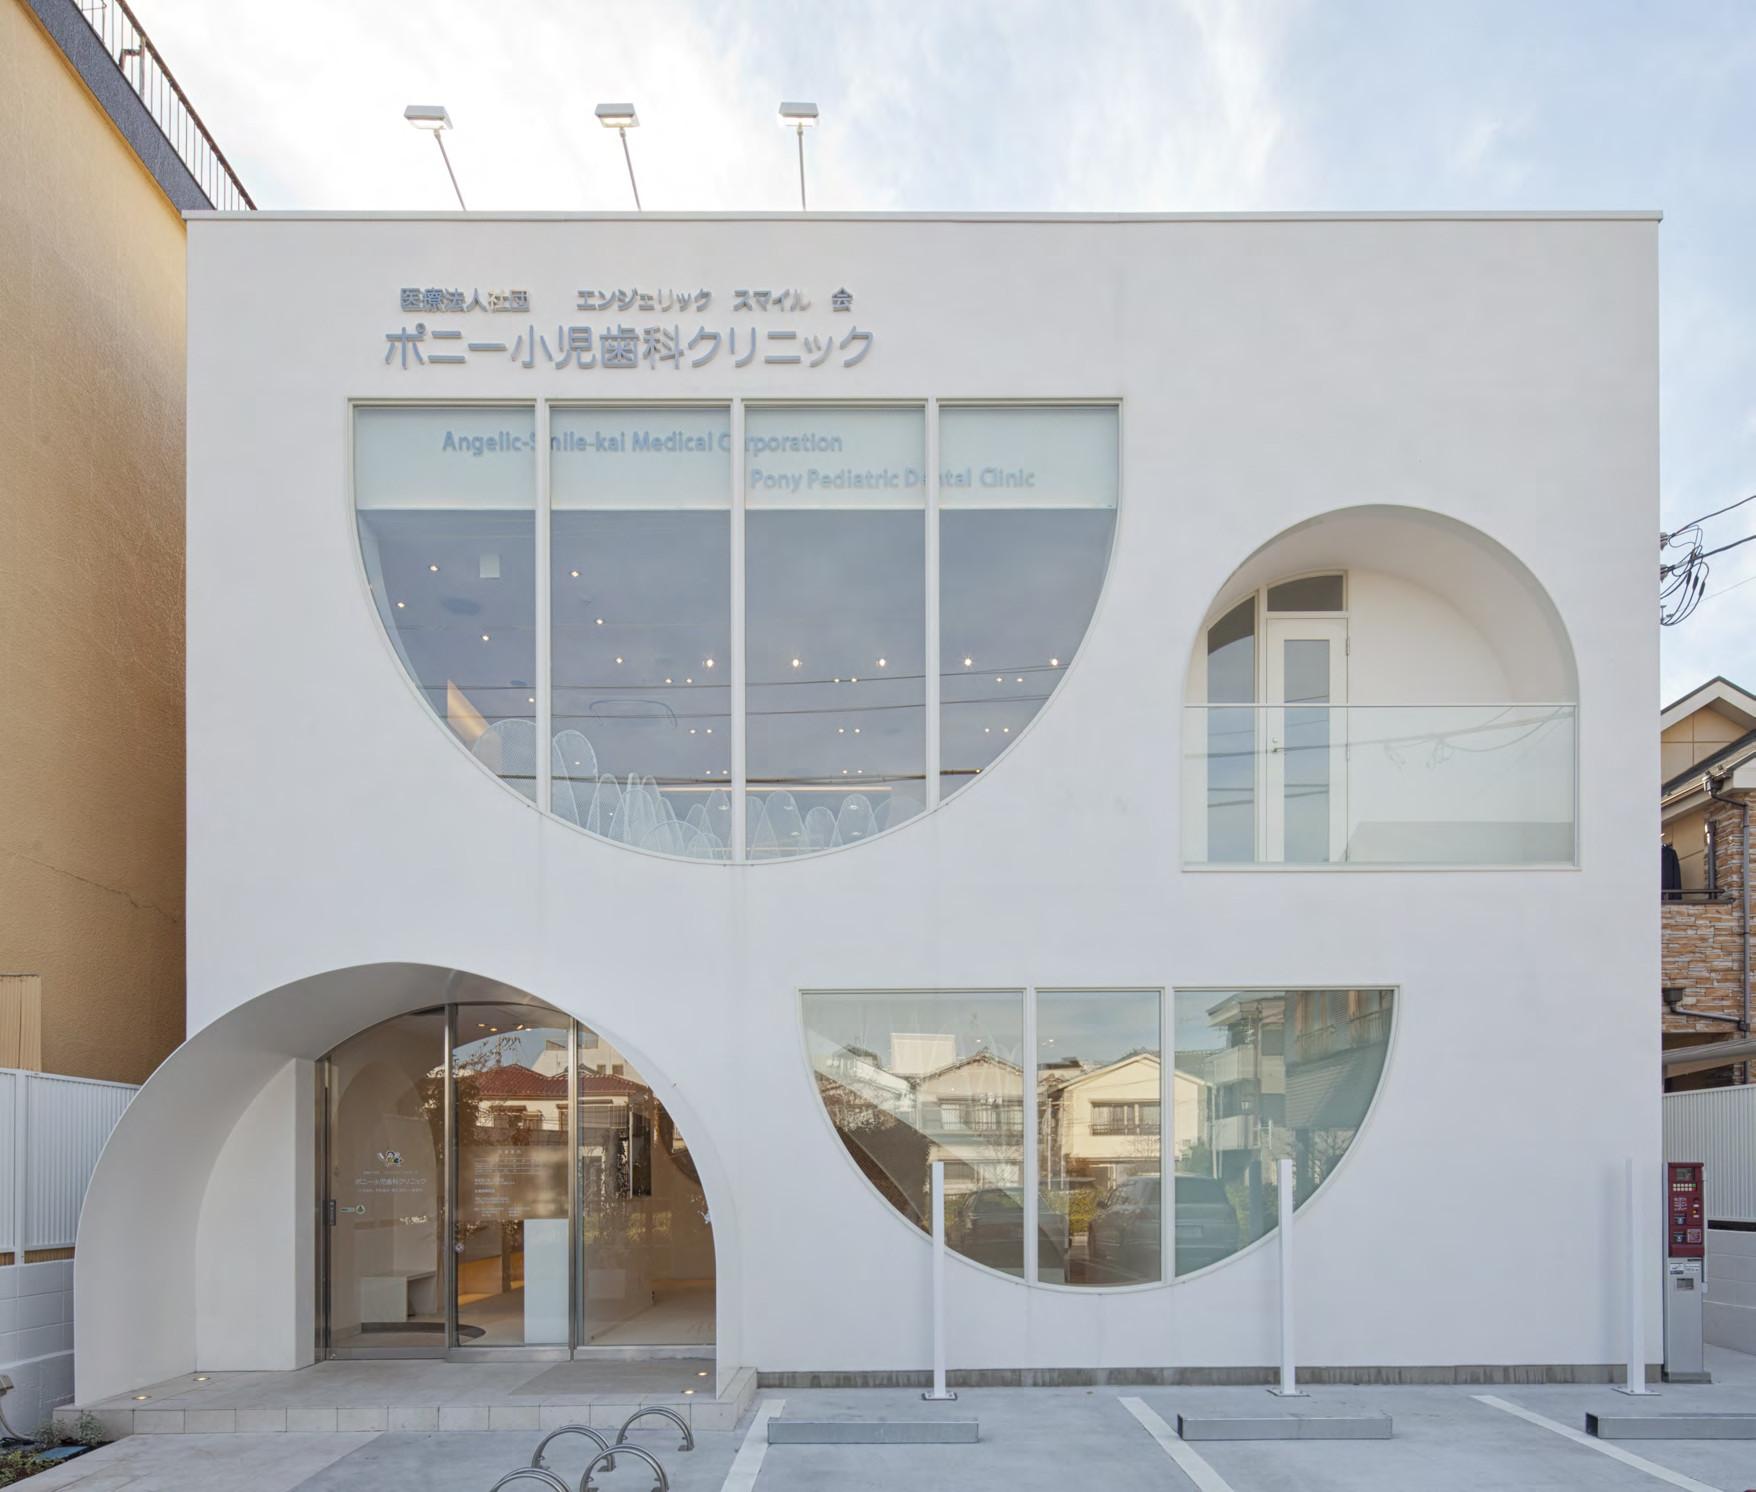 Pony Pediatric Dental Clinic / Masahiro Kinoshita - KINO Architects + KAMITOPEN, © Keisuke Miyamoto